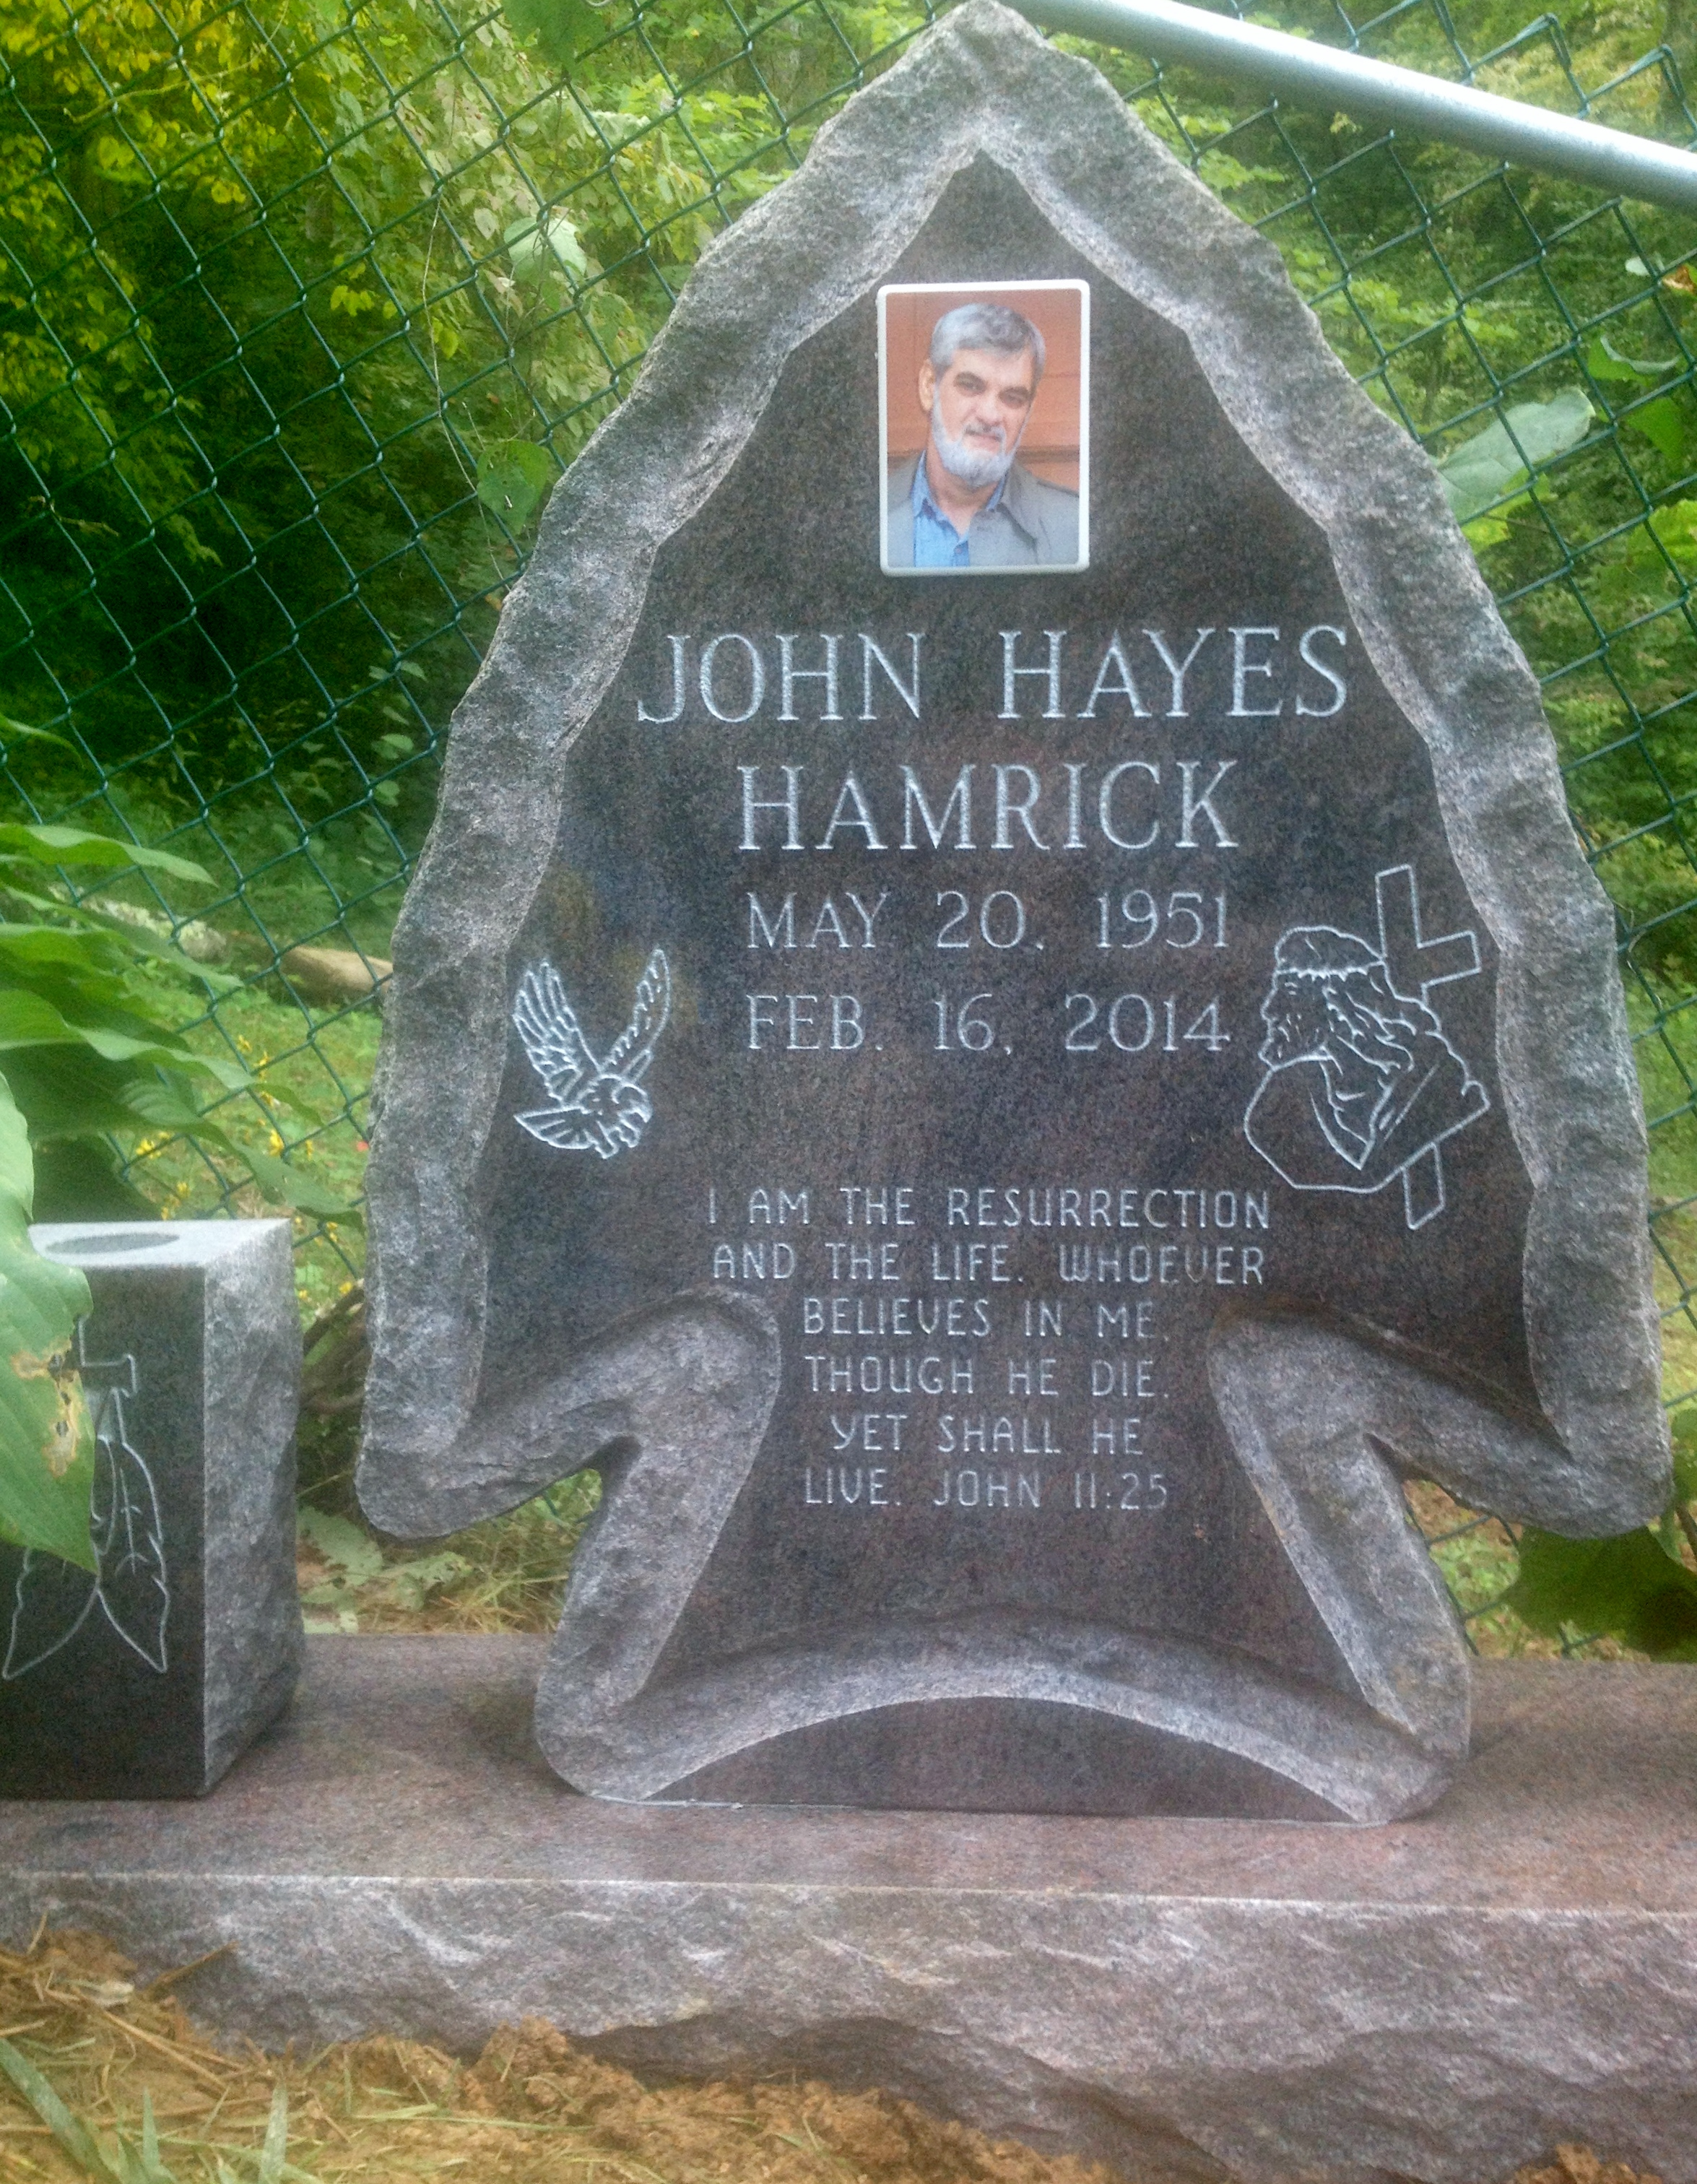 Hamrick